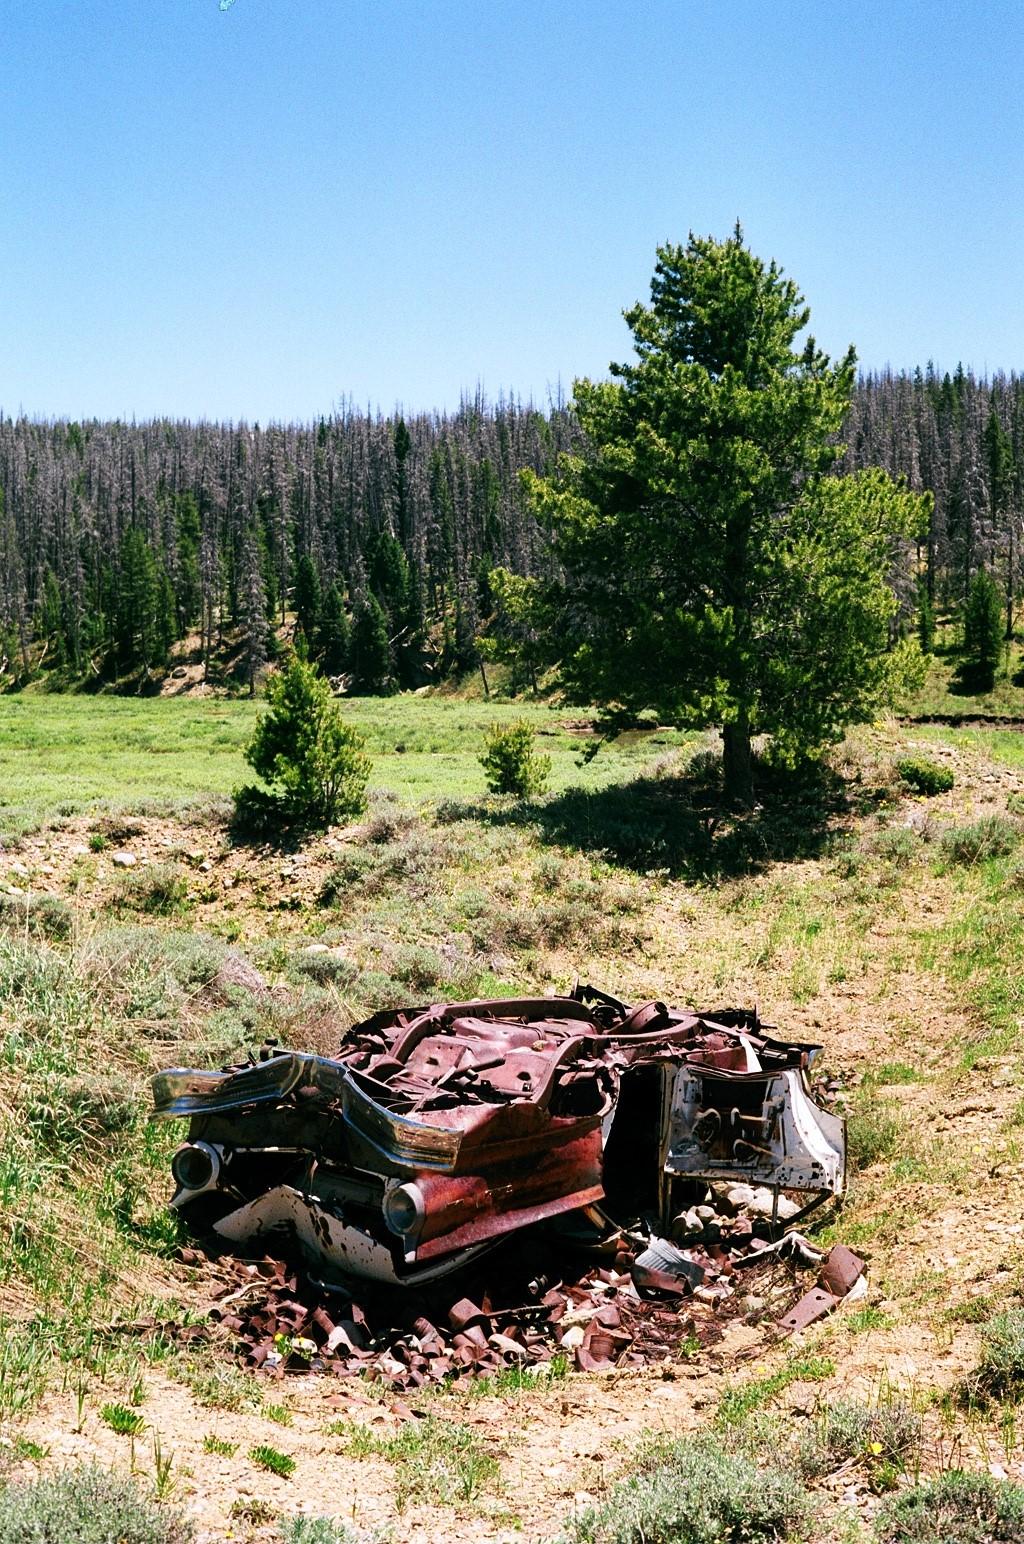 Jake Leininger | Trash in the Green | Canonet GIII | Afga 200